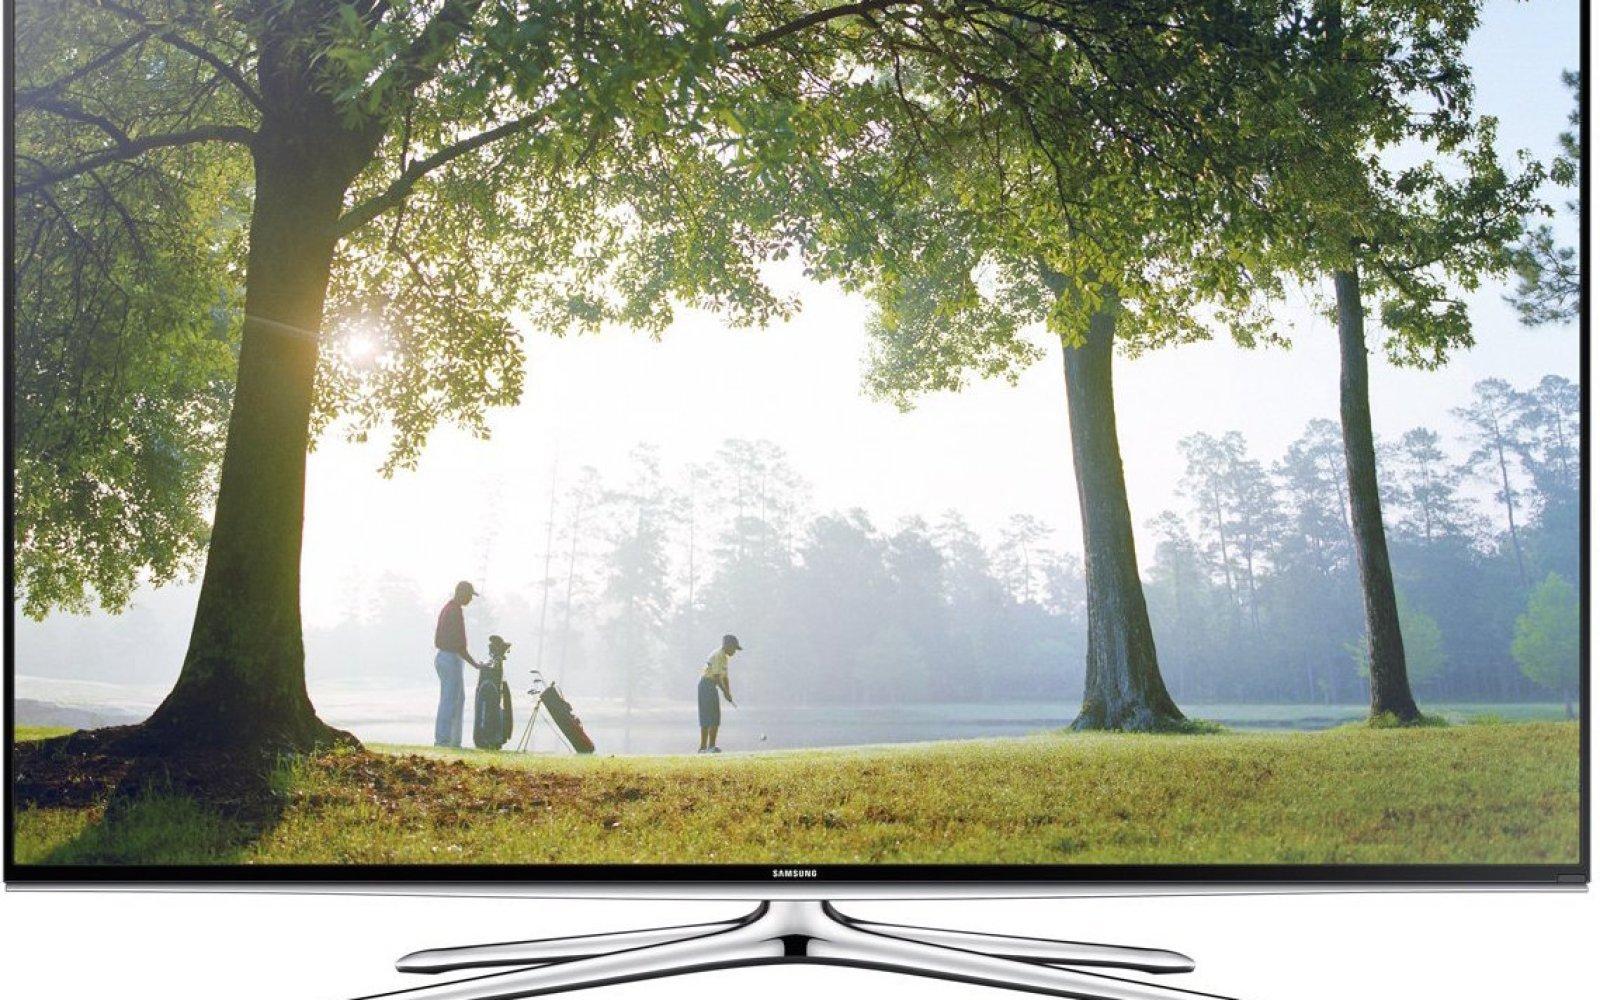 HDTVs: Samsung 48″ Smart $548 (orig. $848), Samsung 51″ Plasma $348 (orig. $879), more